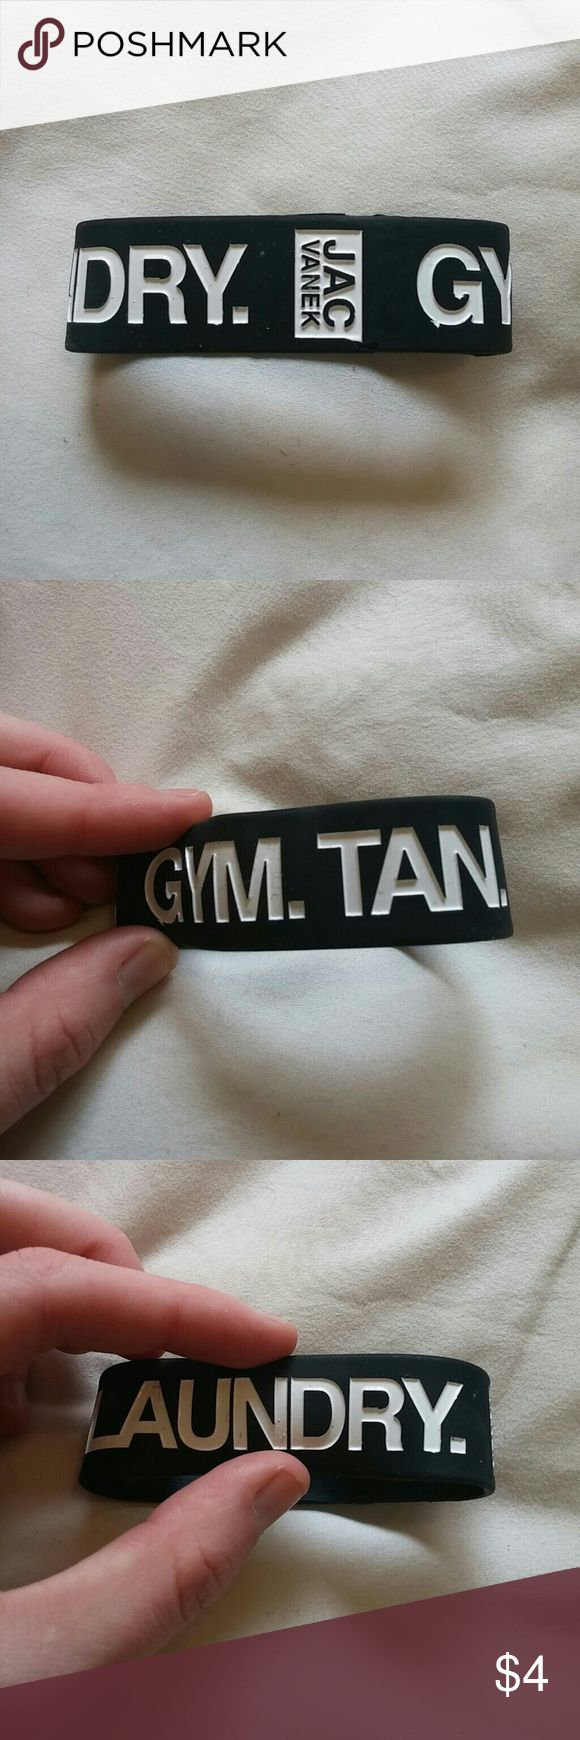 Jac Vanek brand rubber bracelet New and never worn. Black rubber bracelet from Jac Vanek. Reads: Gym. Tan. Laundry. Jac Vanek Accessories